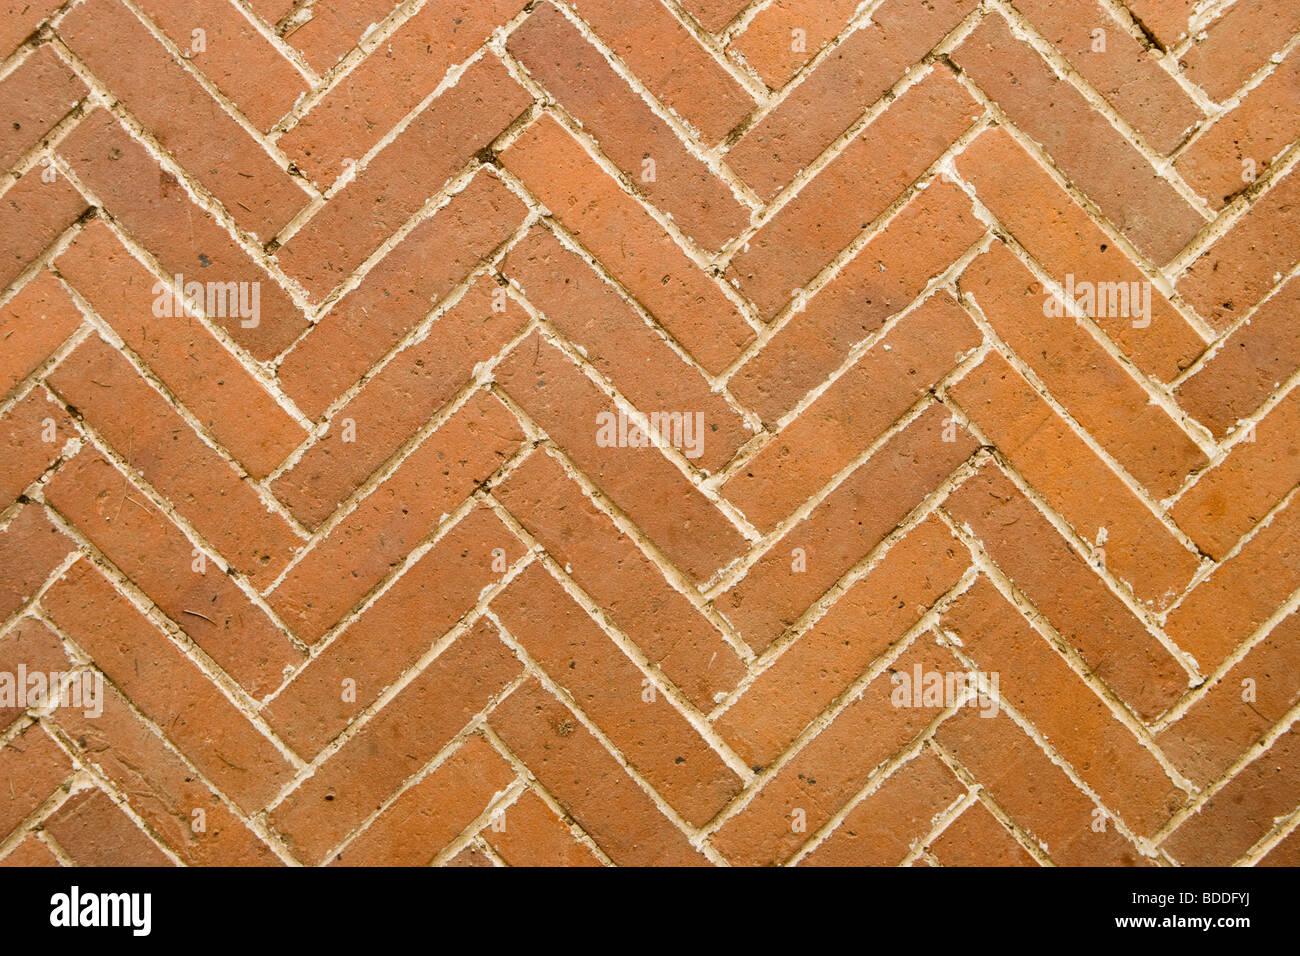 Brick paving in herringbone pattern. - Stock Image